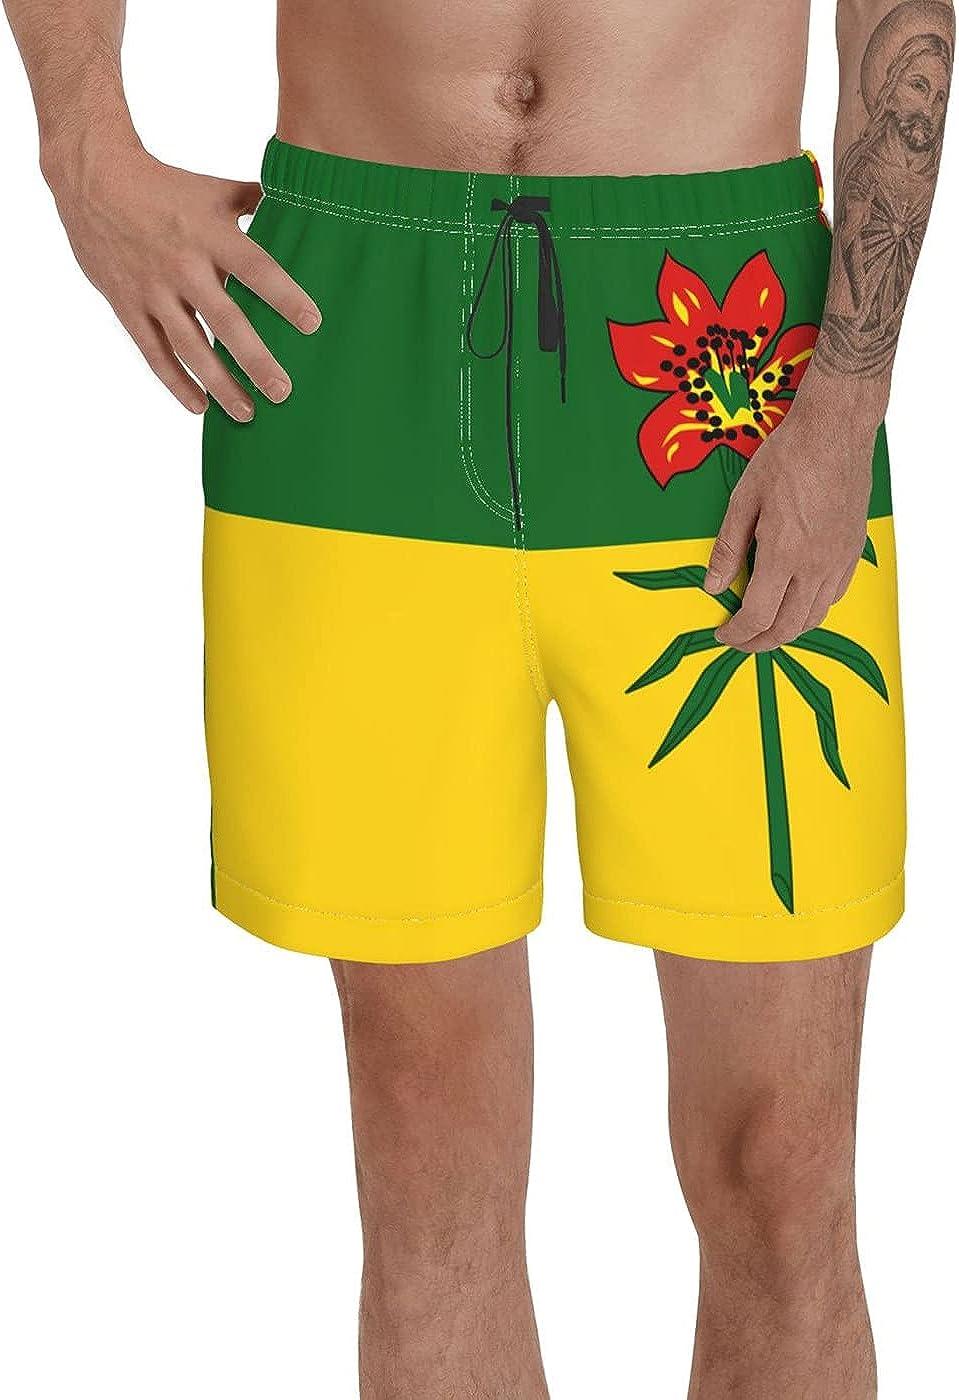 Count Saskatchewan Flag Men's 3D Printed Funny Summer Quick Dry Swim Short Board Shorts with